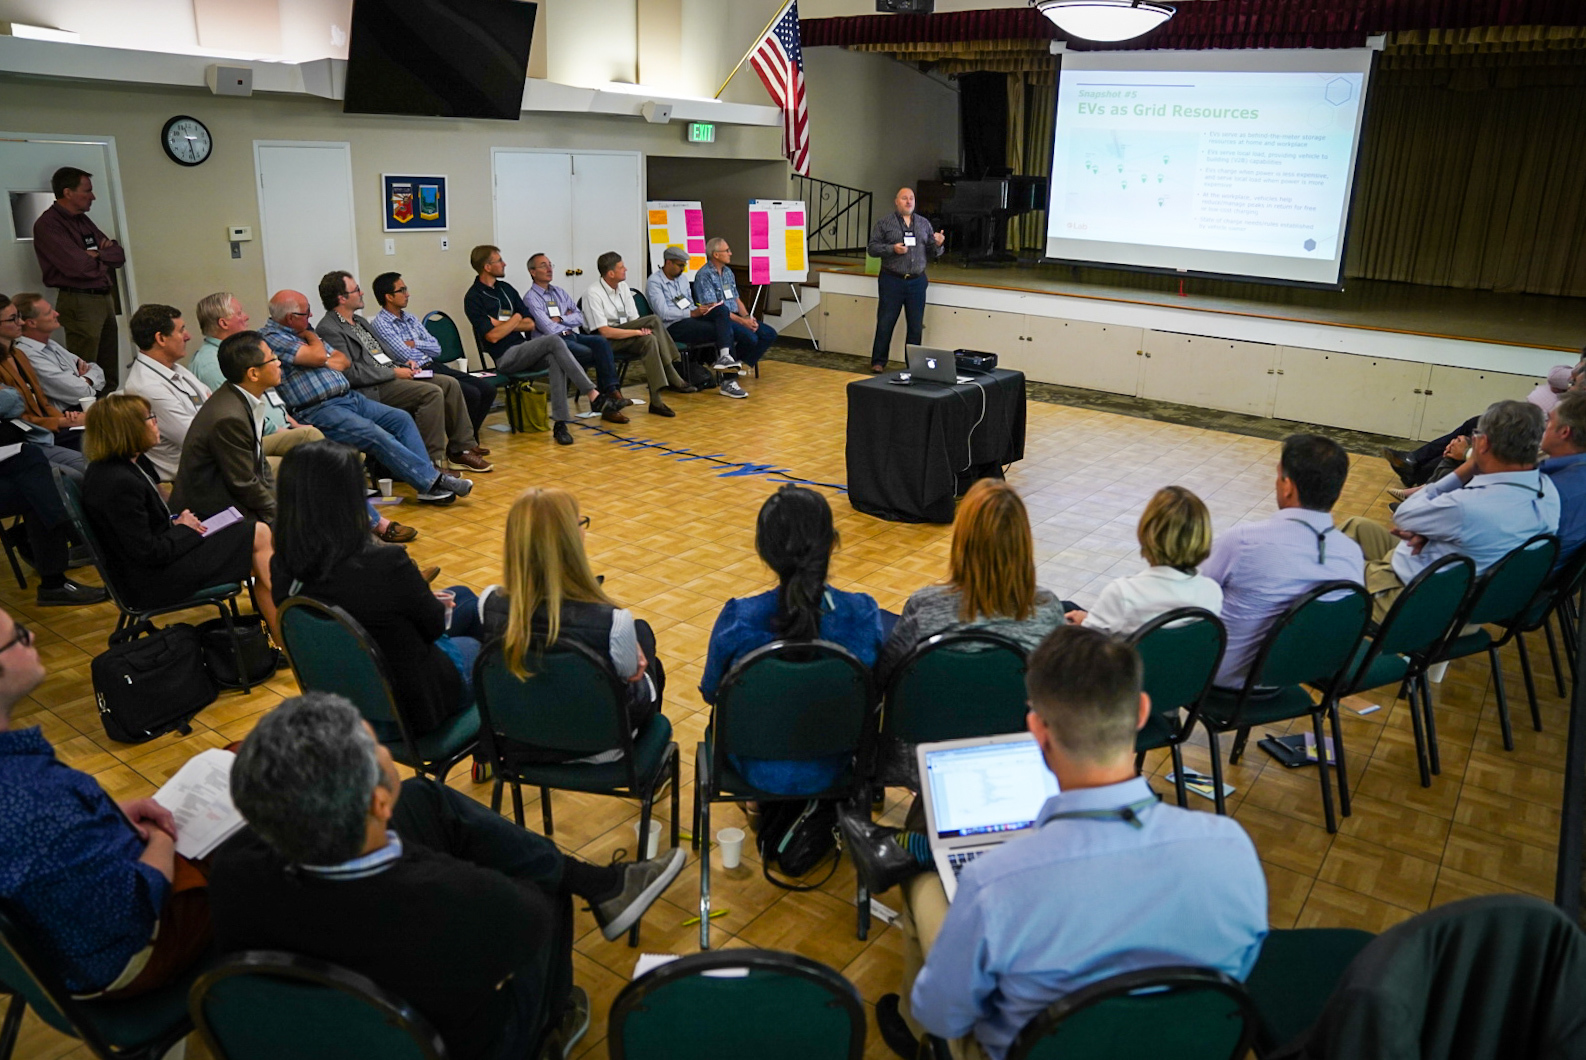 SVCE Staff addressing crowd of innovators